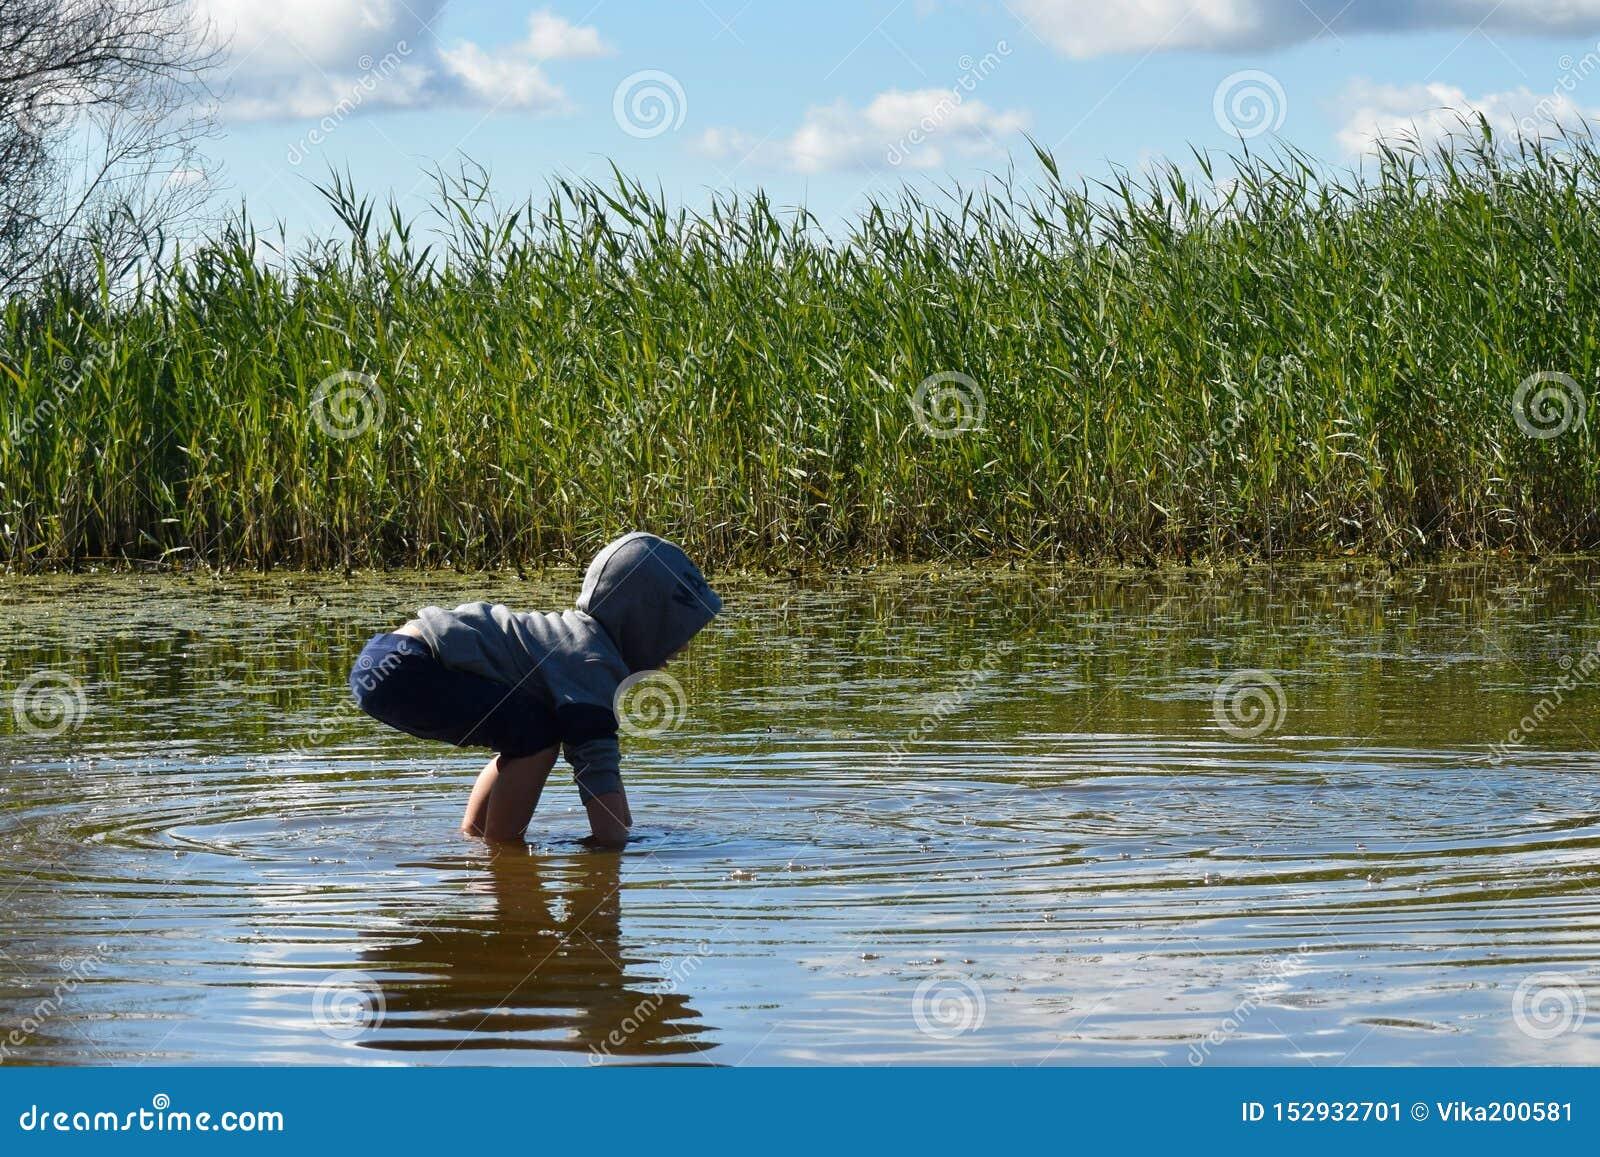 High green grass around the lake. Child walk in water